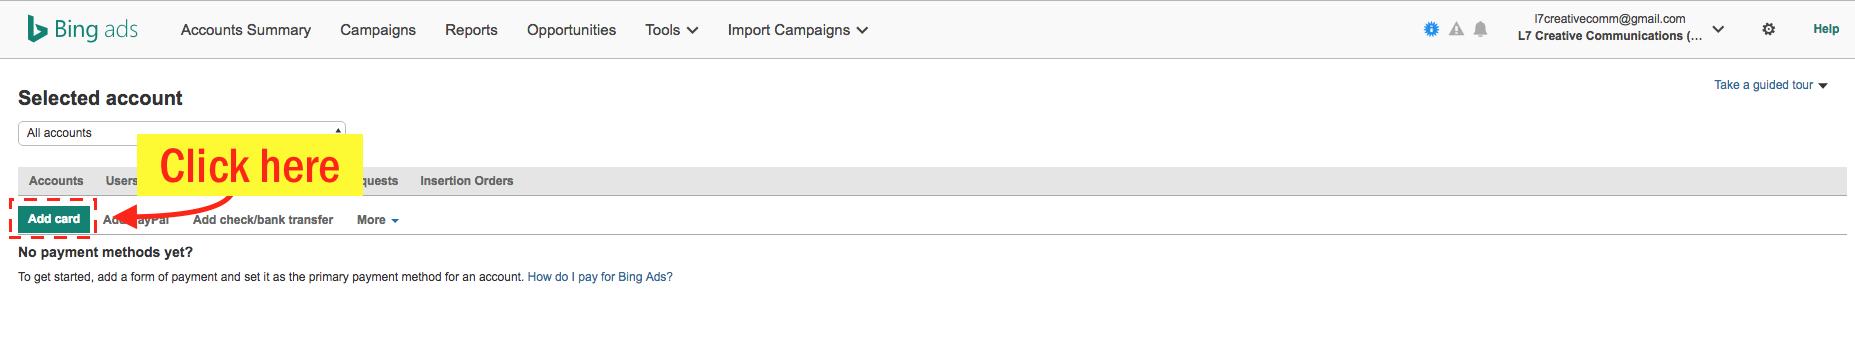 Edit Your Bing Ads Payment Info - Step 5 Screenshot